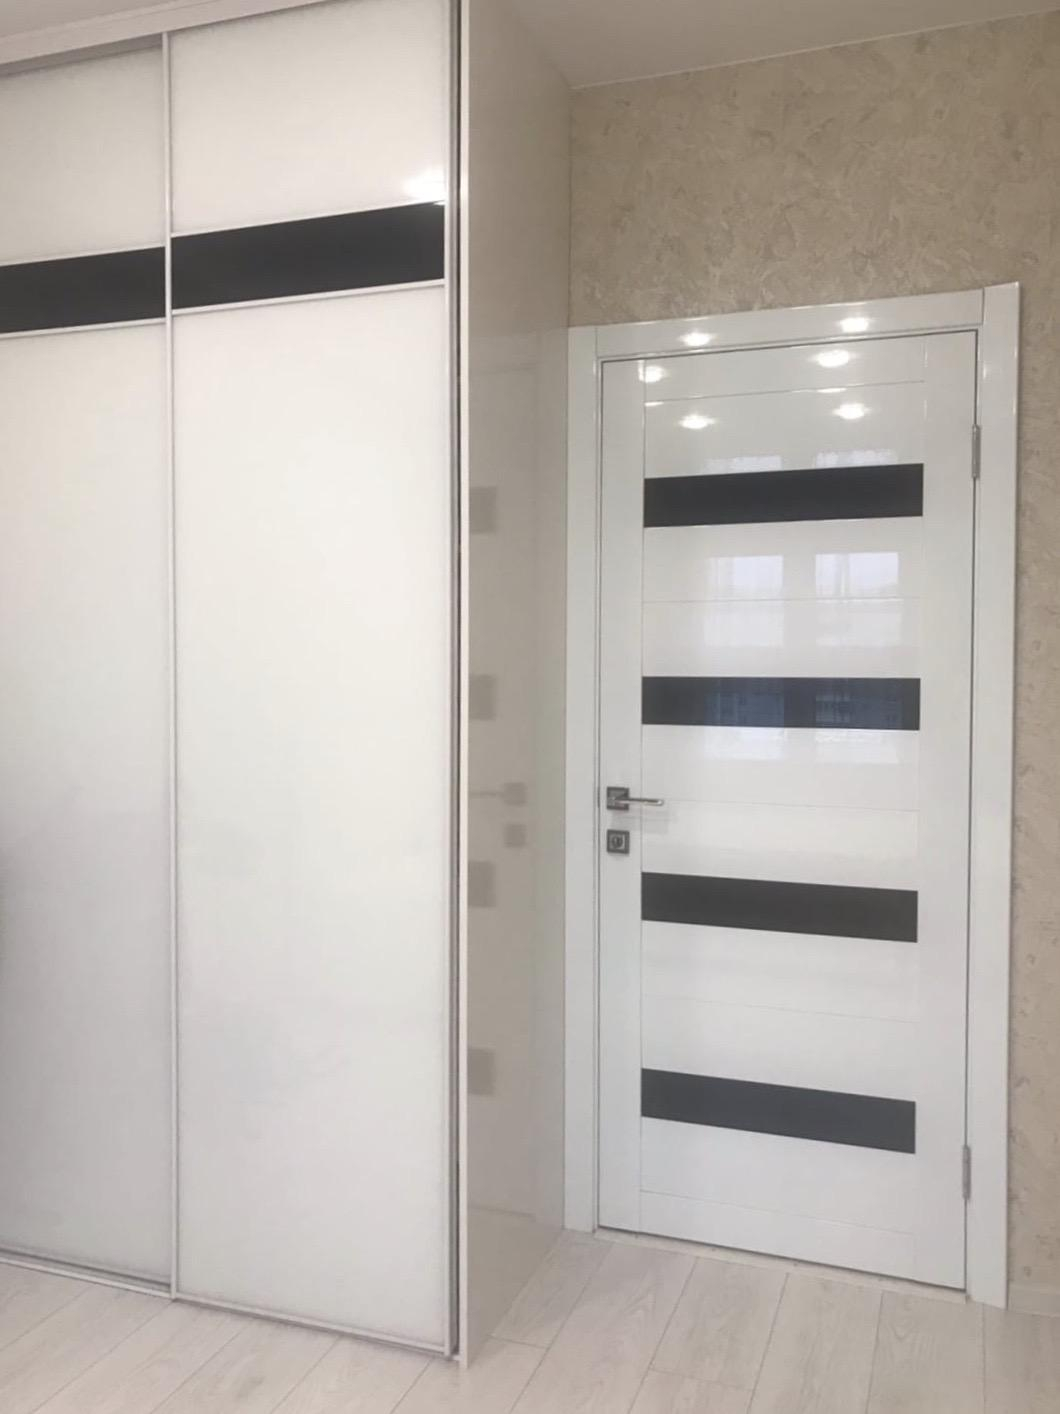 1к квартира Ярыгинская набережная, 29, Россия | 12500 | аренда в Красноярске фото 9